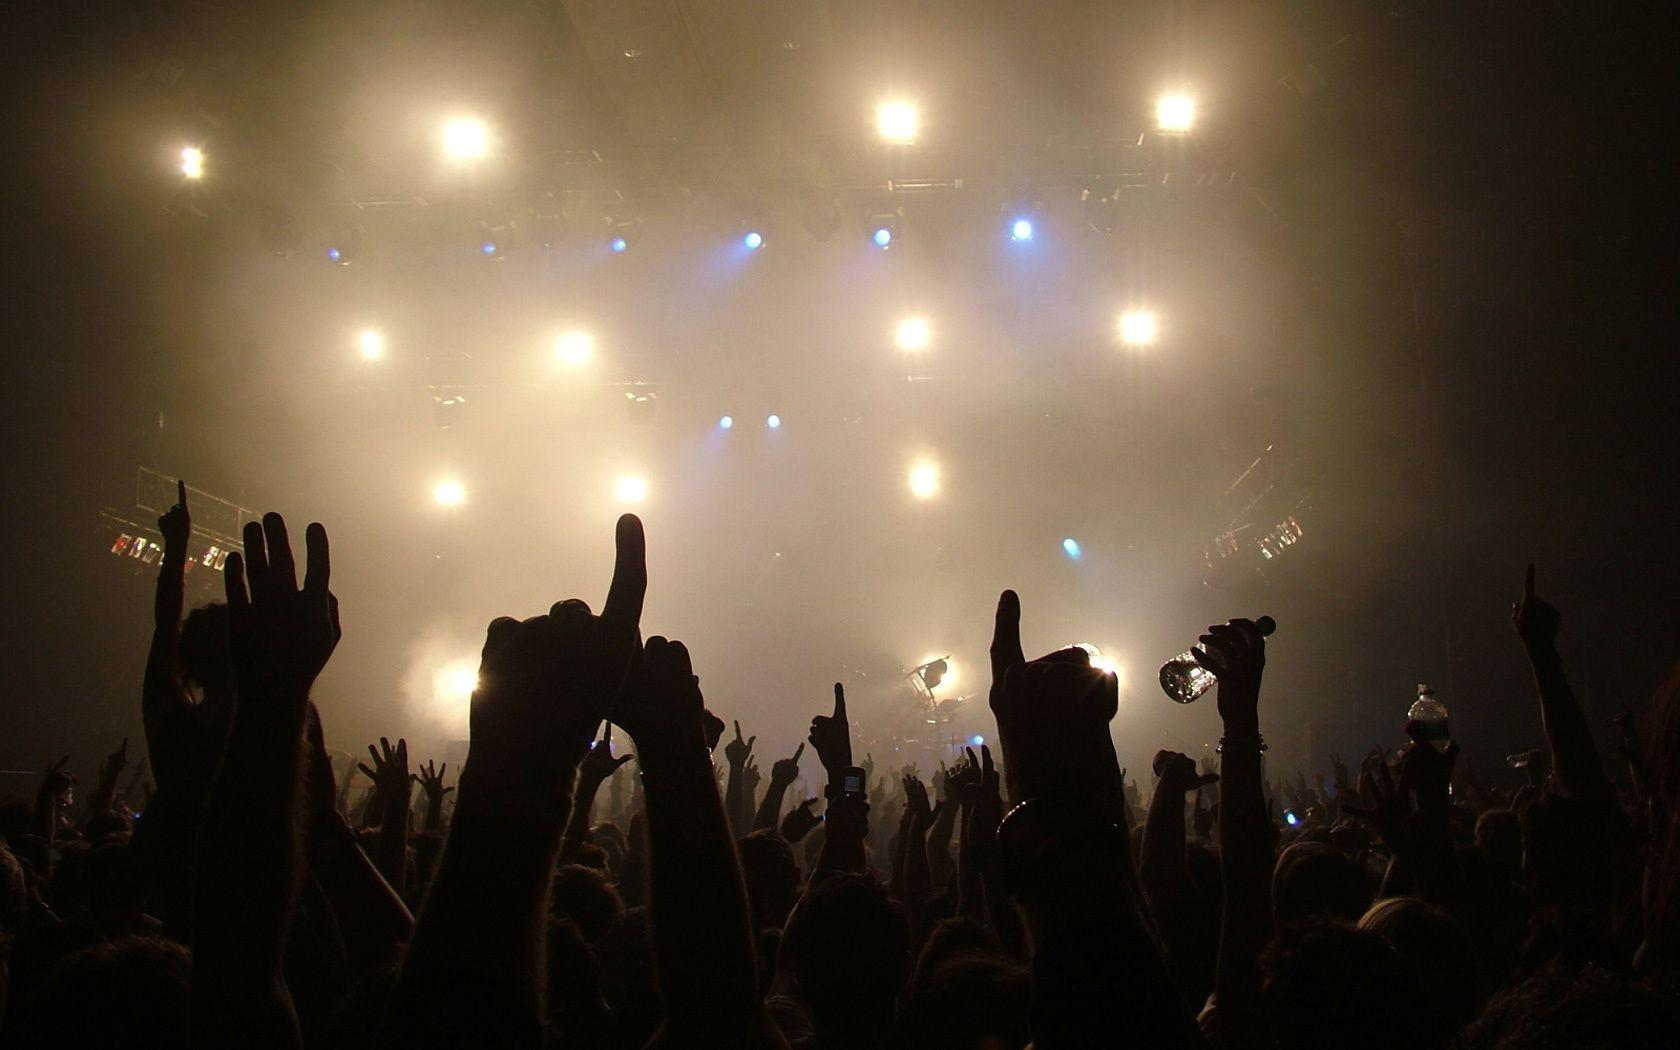 Copenhagen Live Concerts